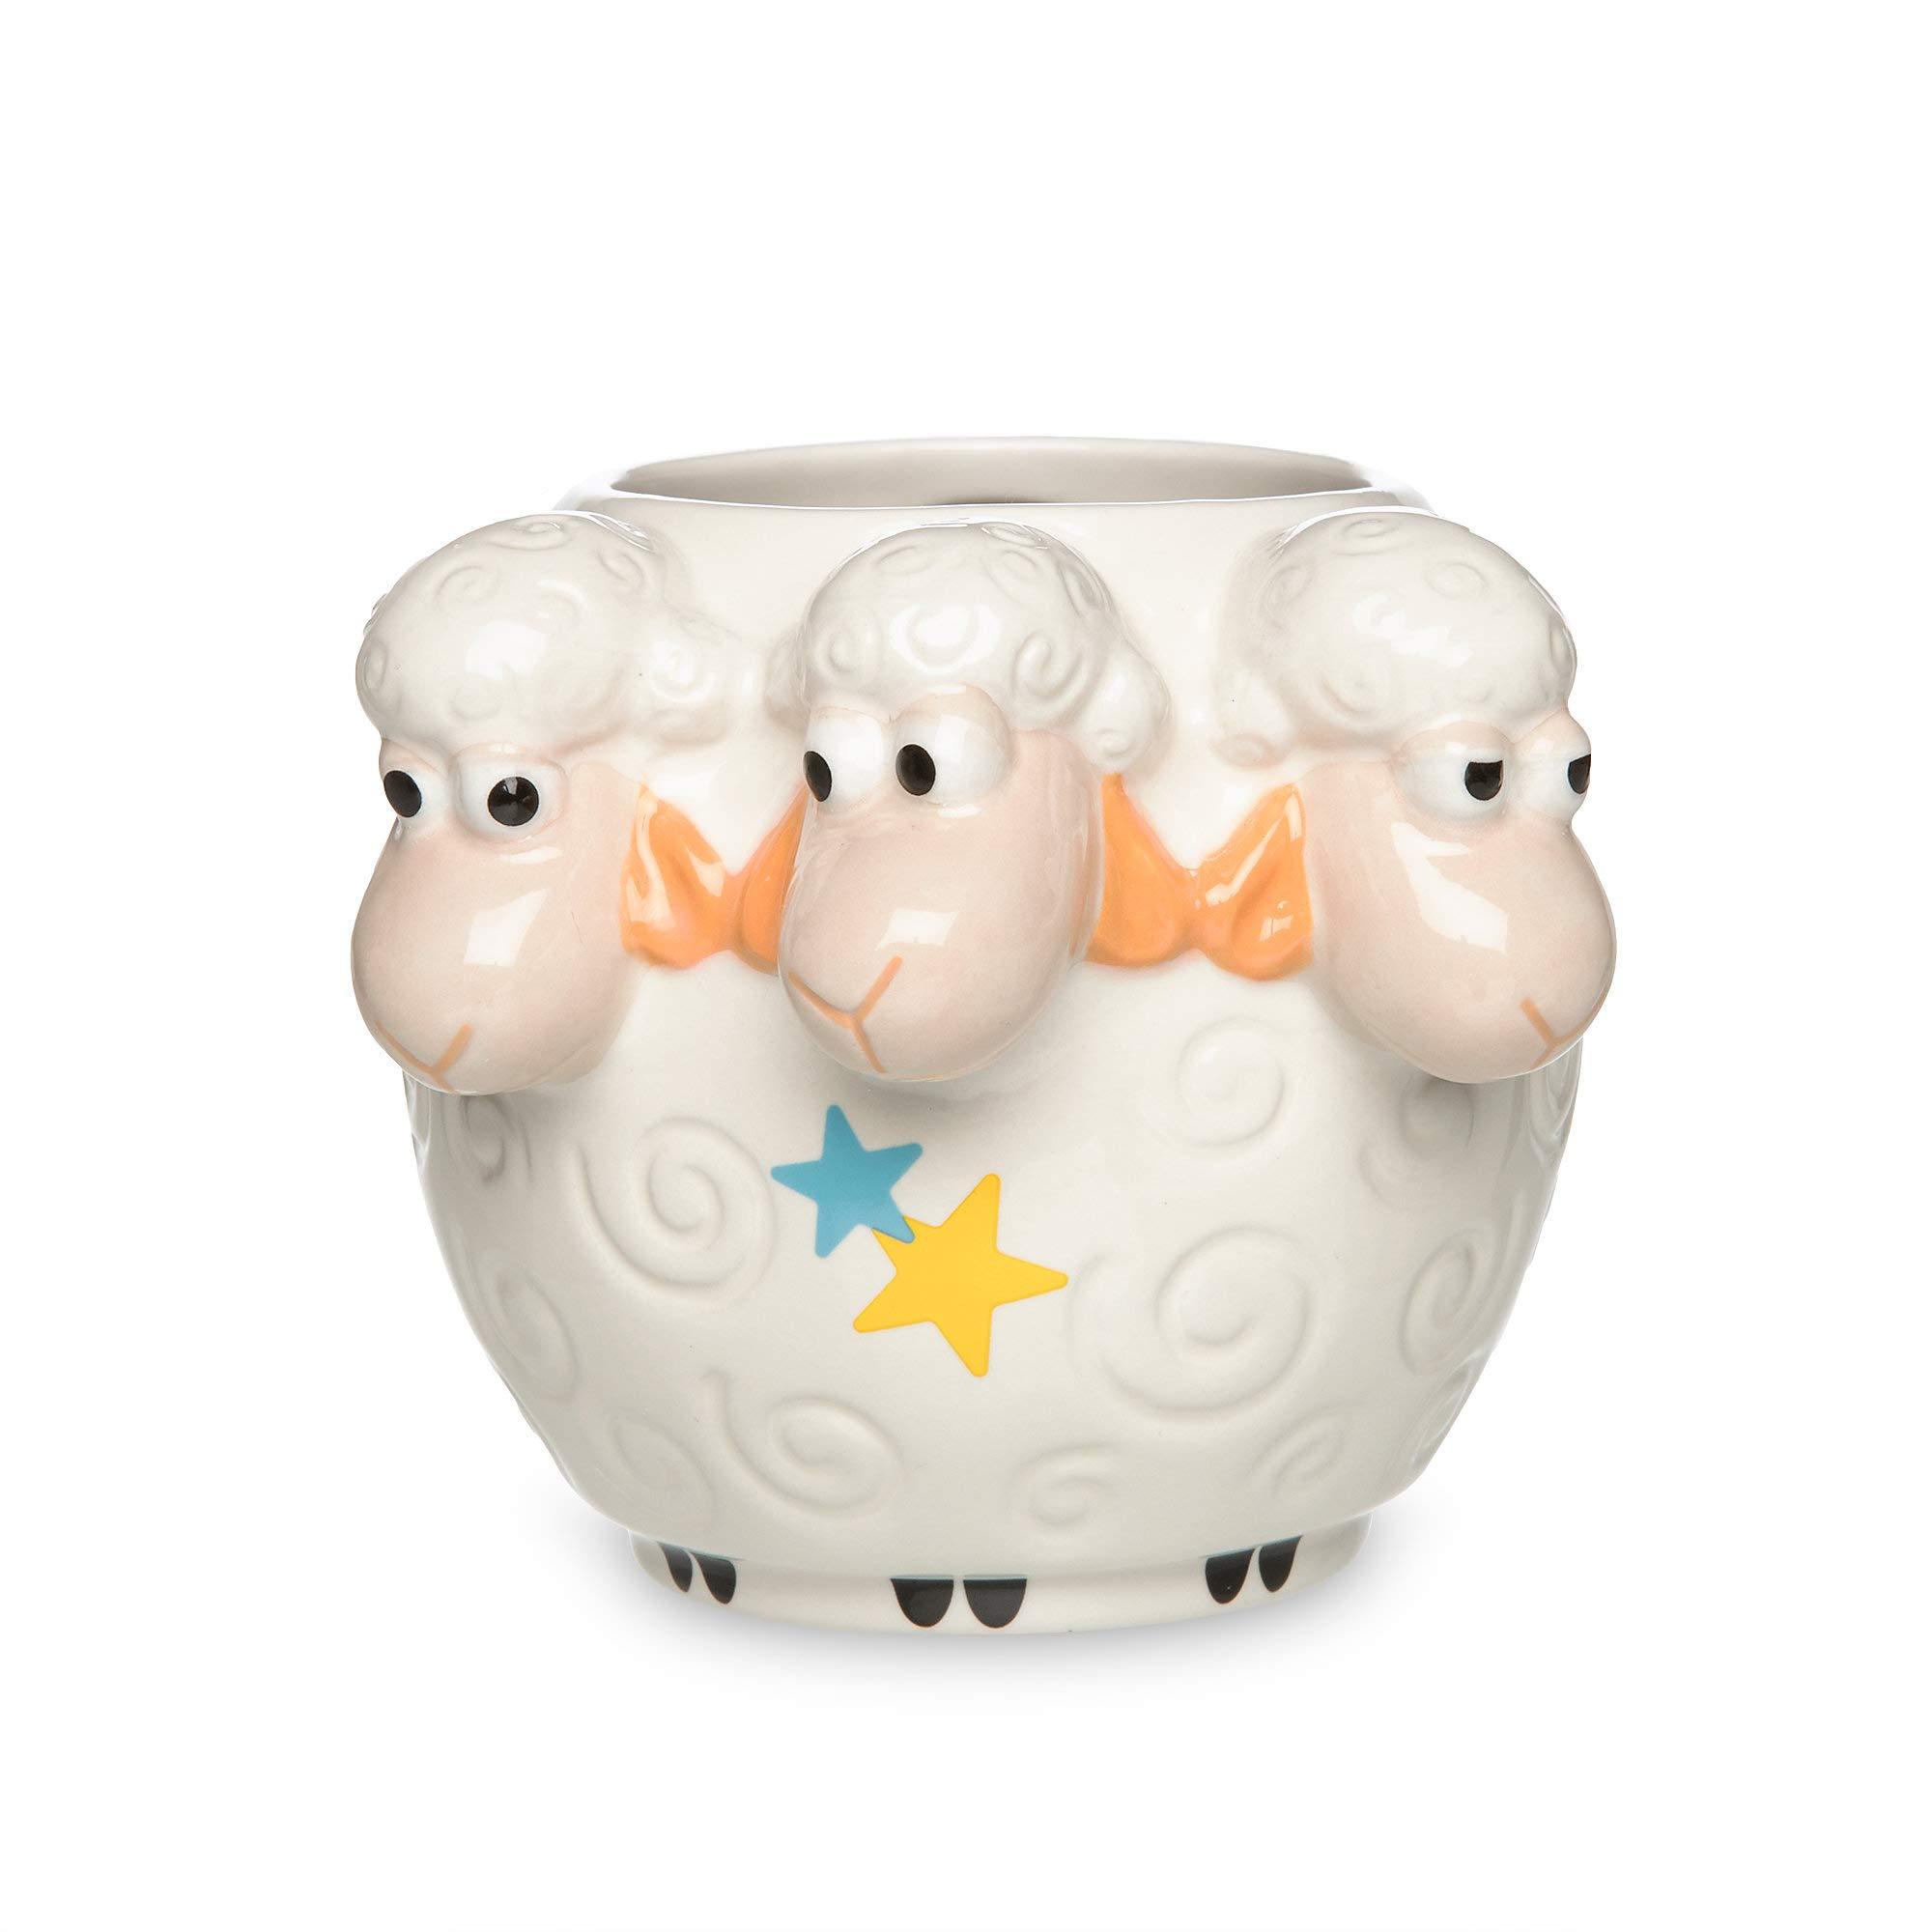 ویکالا · خرید  اصل اورجینال · خرید از آمازون · Disney Bo Peep Sheep Mug - Toy Story 4 wekala · ویکالا